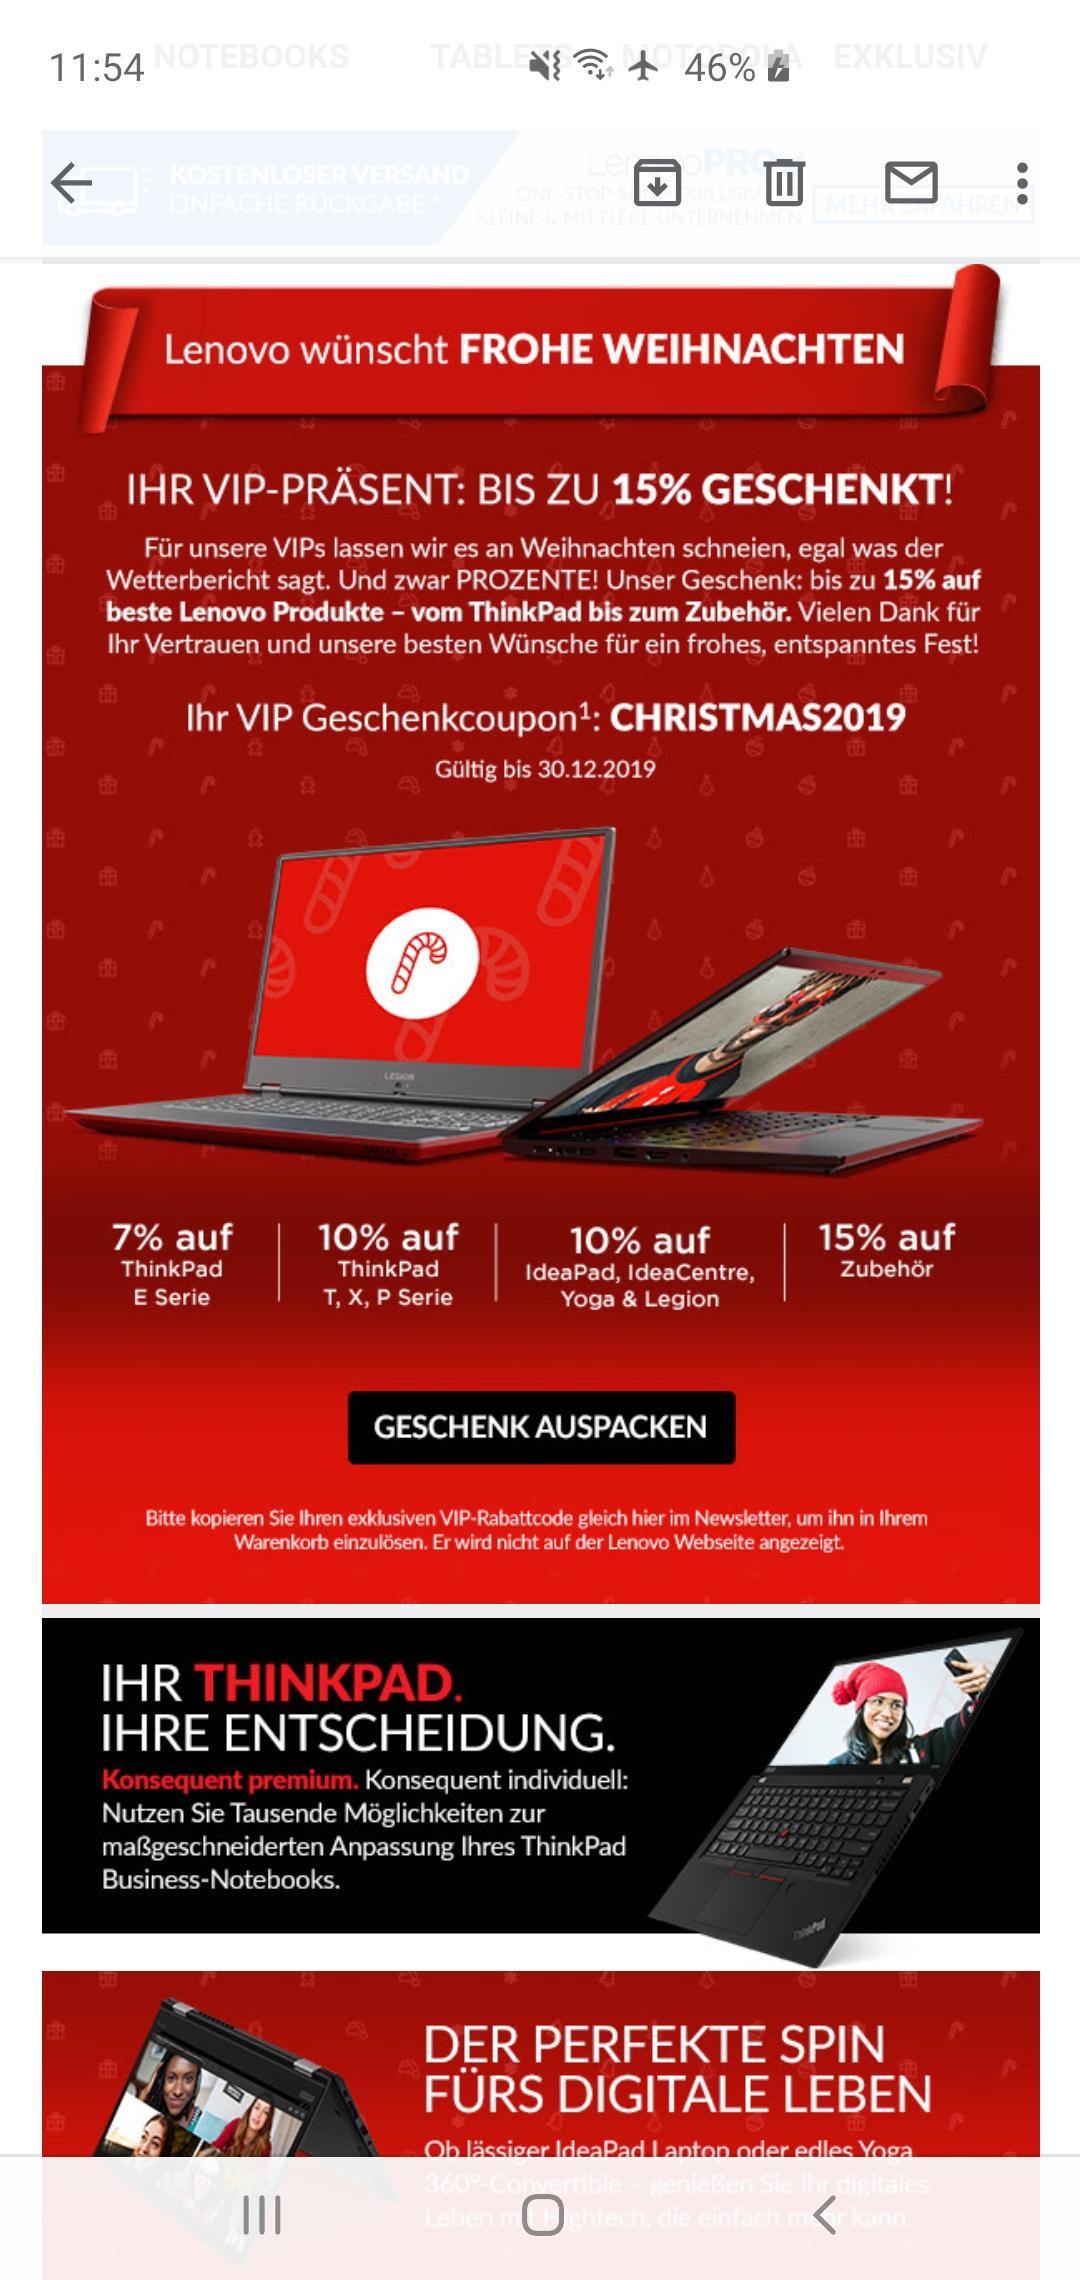 Lenovo VIP-Weihnachtsgeschenk 7-10% ThinkPad IdeaPad IdeaCentre Yoga Legion